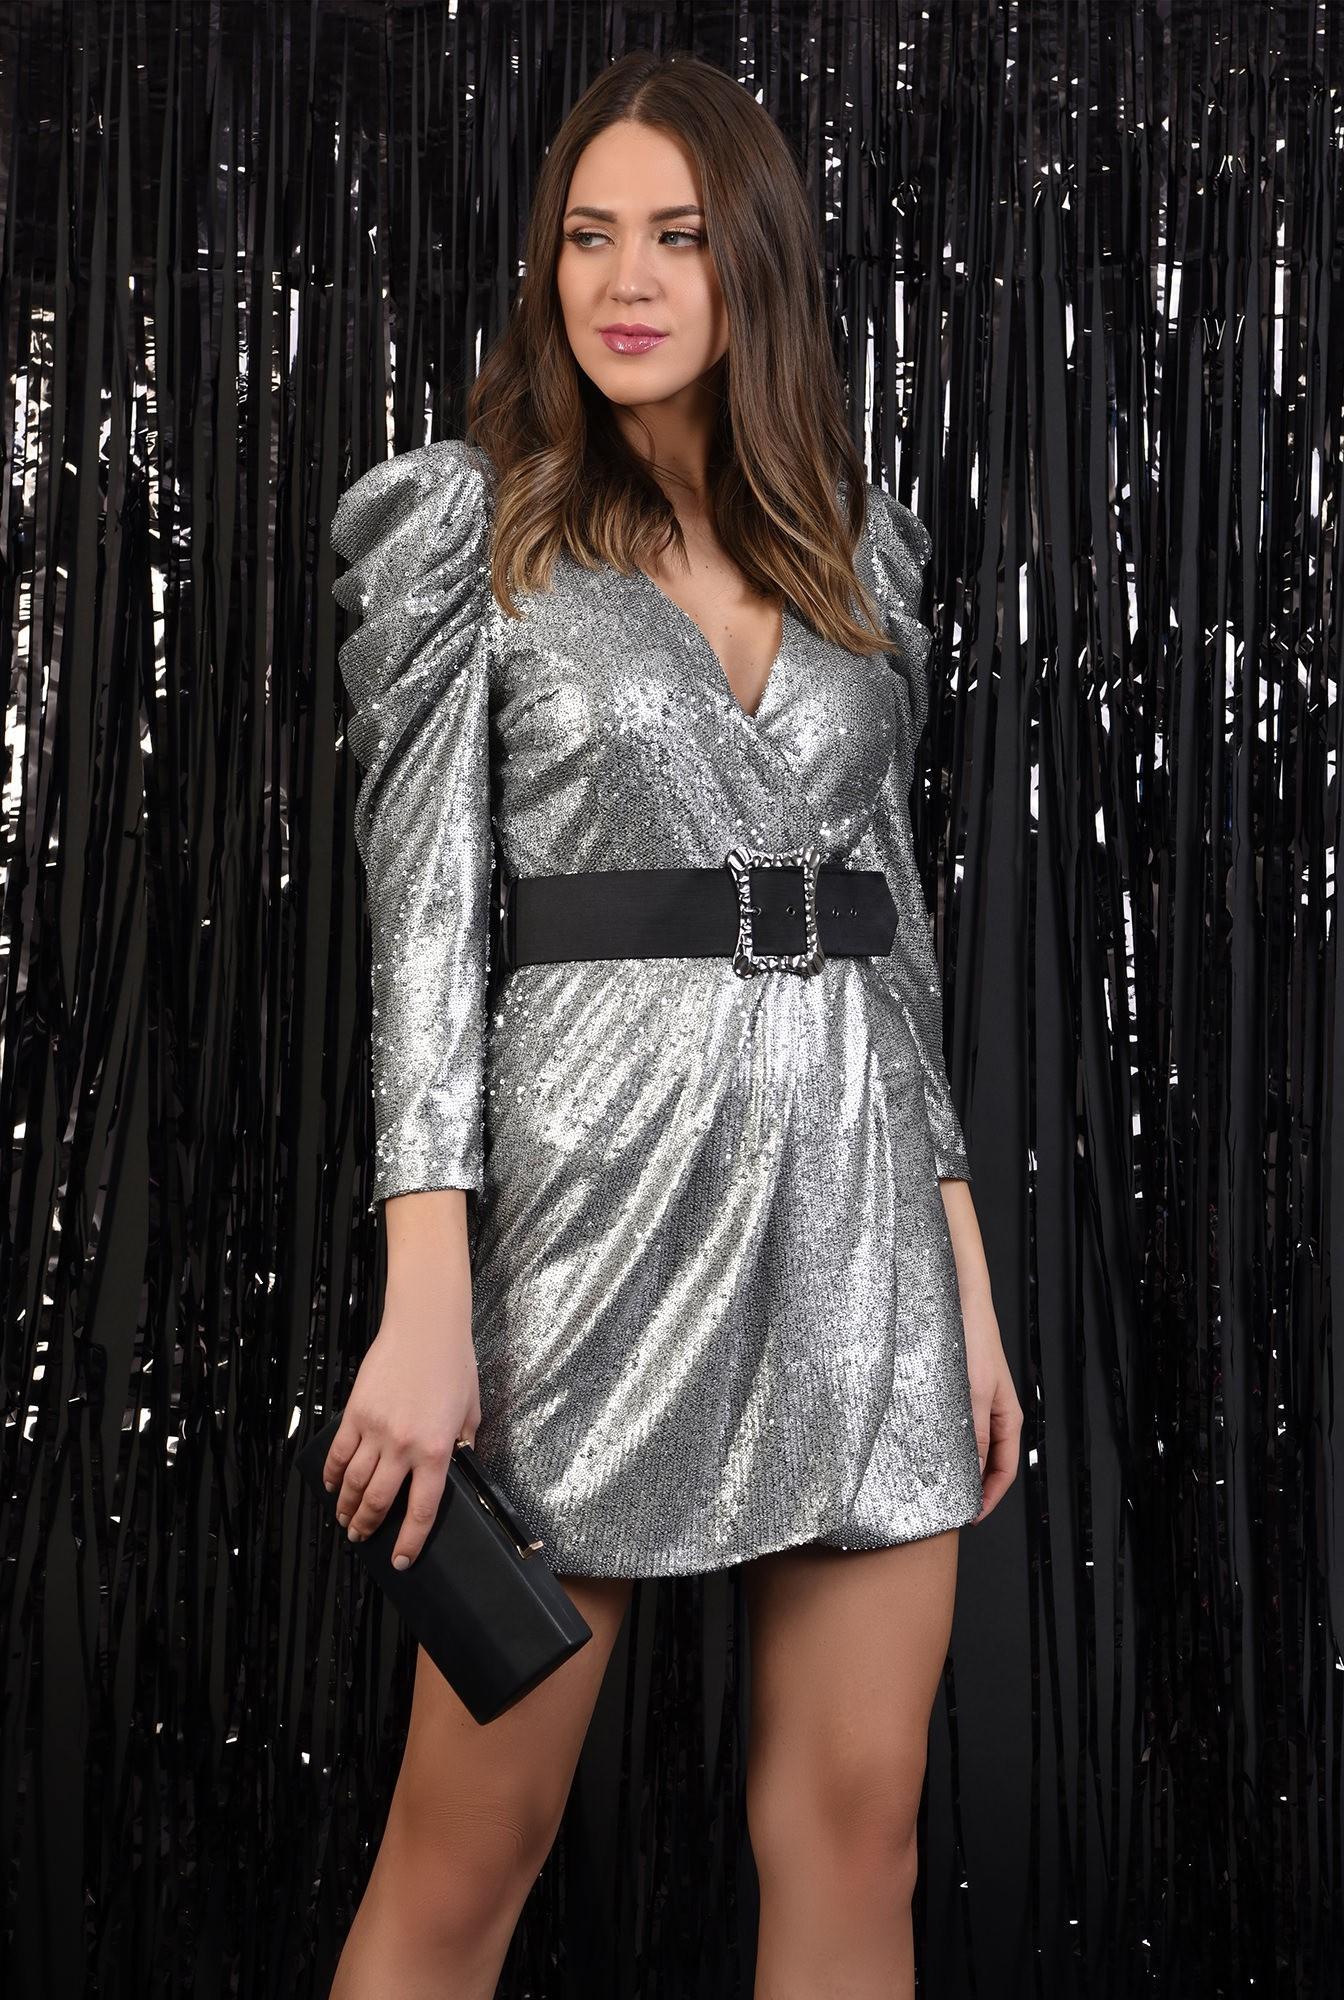 0 - rochie cu paiete, Poema, argintie, scurta, petrecuta, cu centura